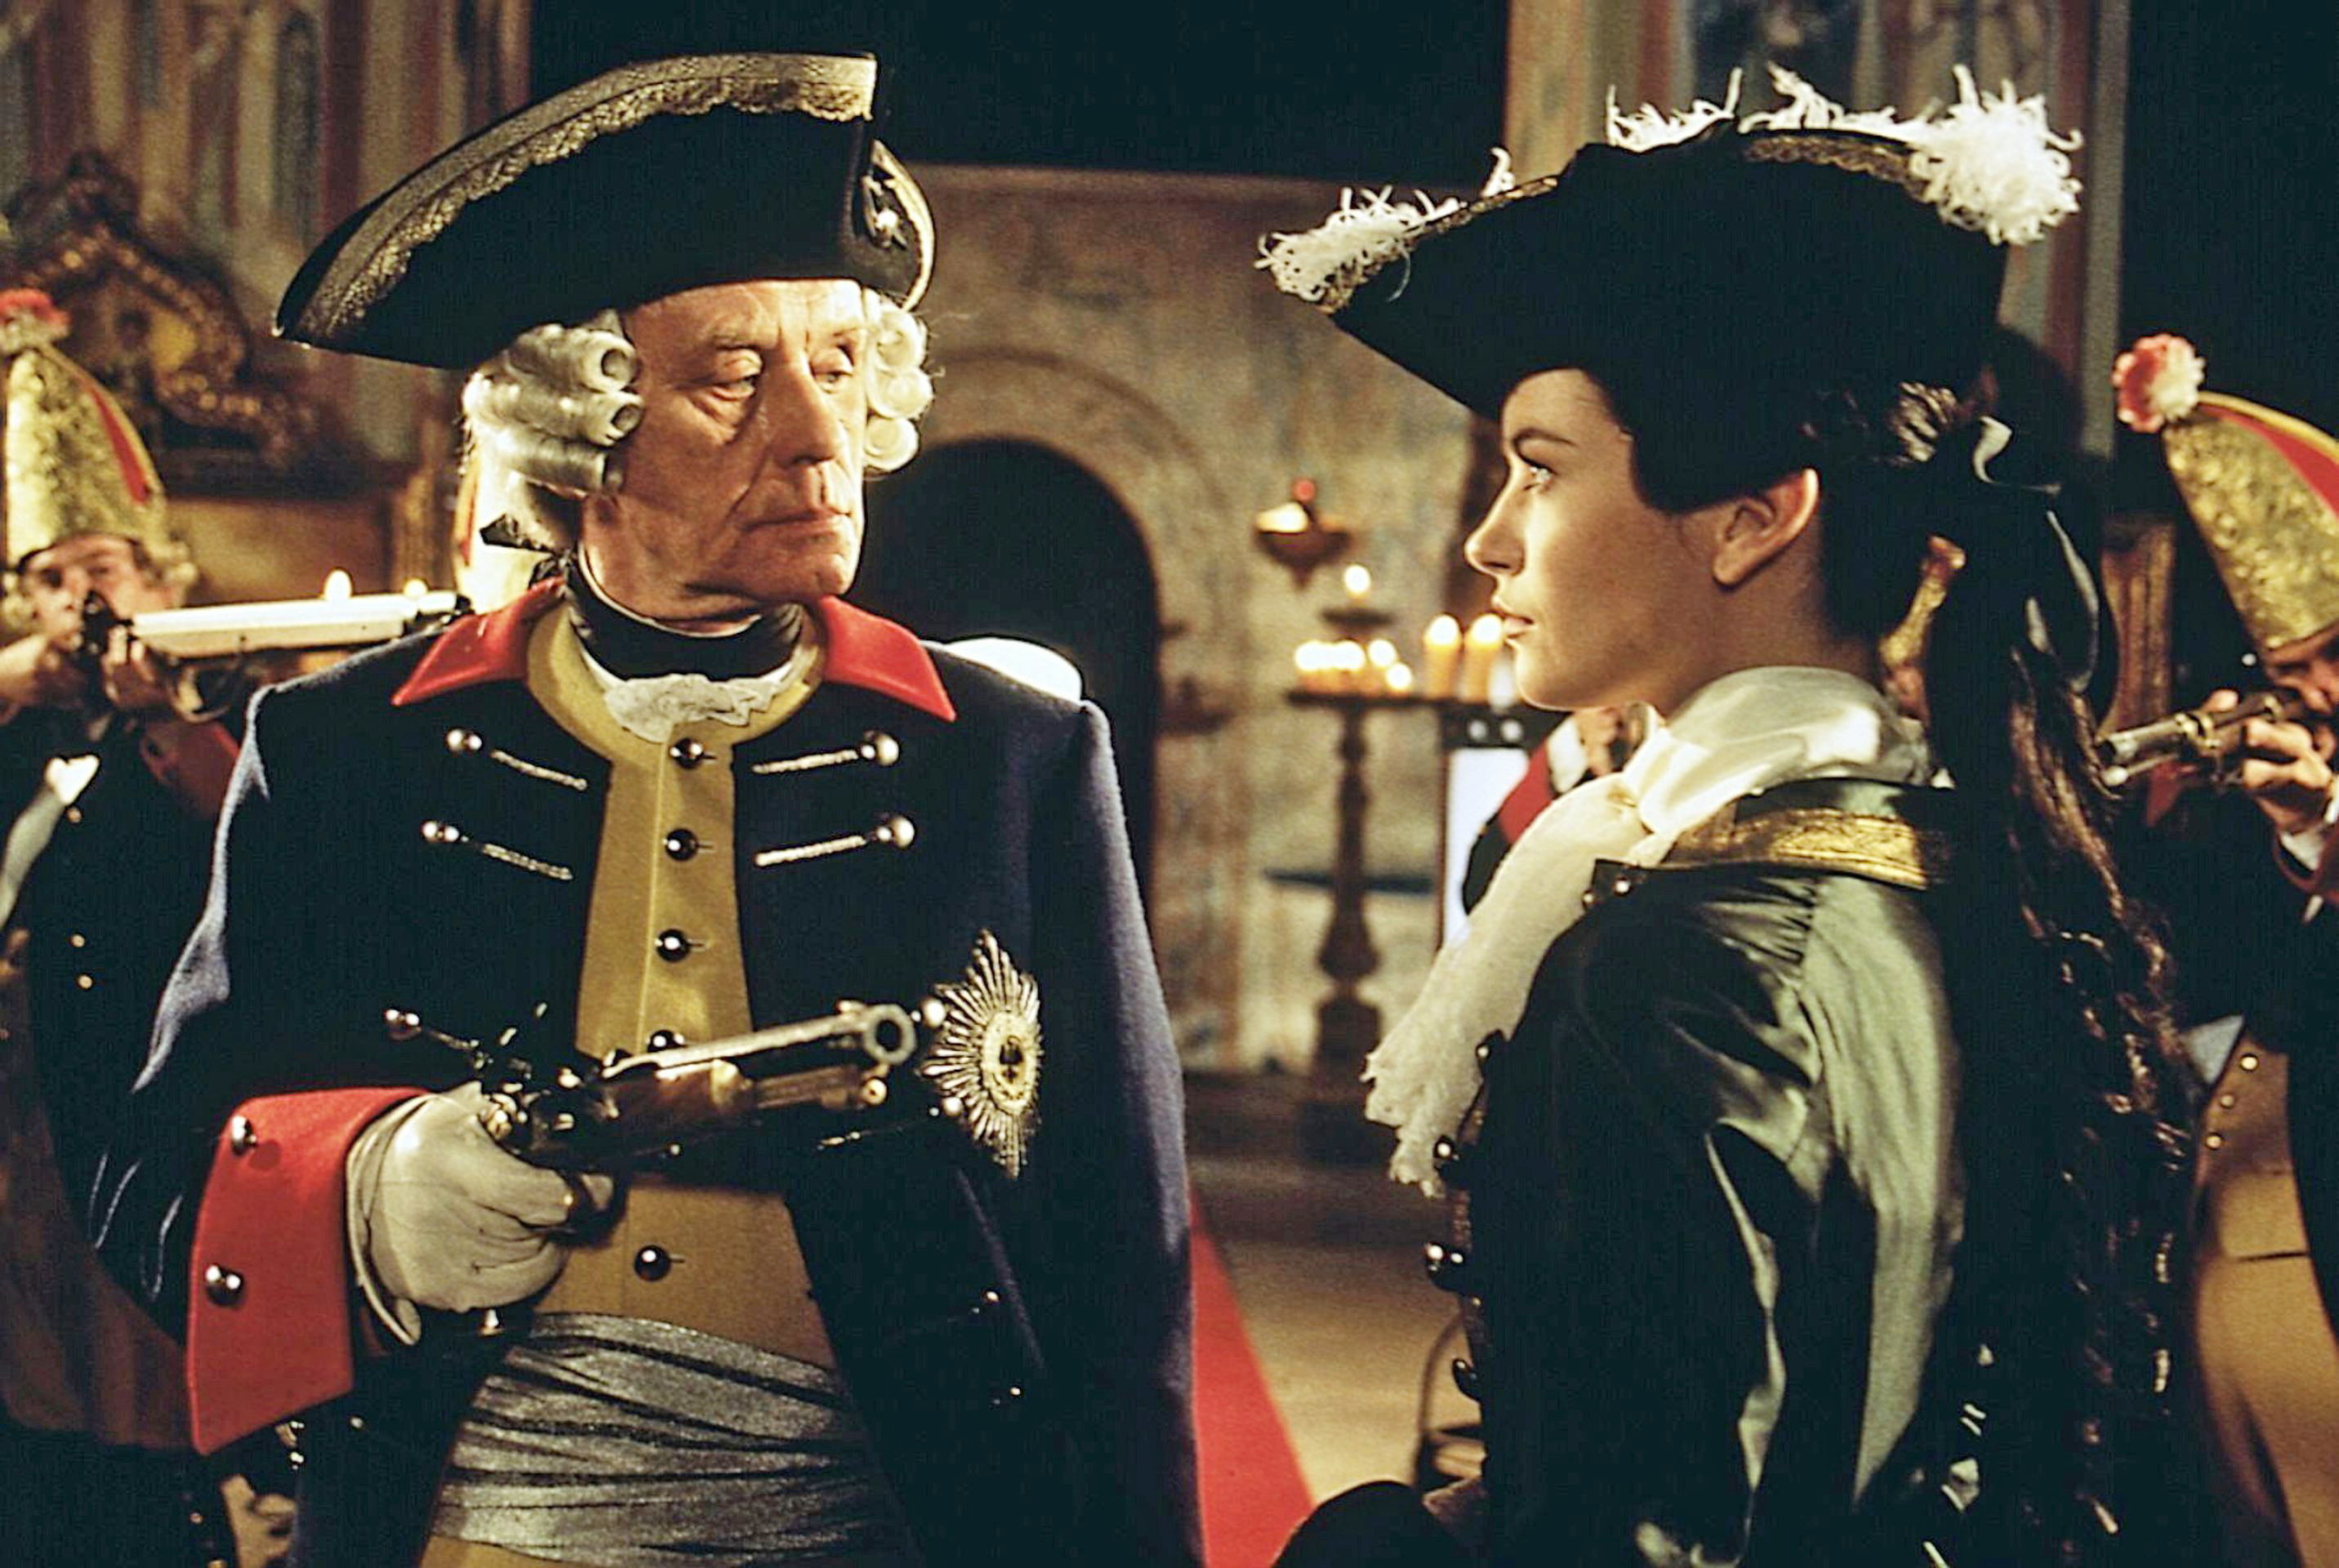 Catherine Zeta-Jones and Horst Frank in Catherine the Great (1995)